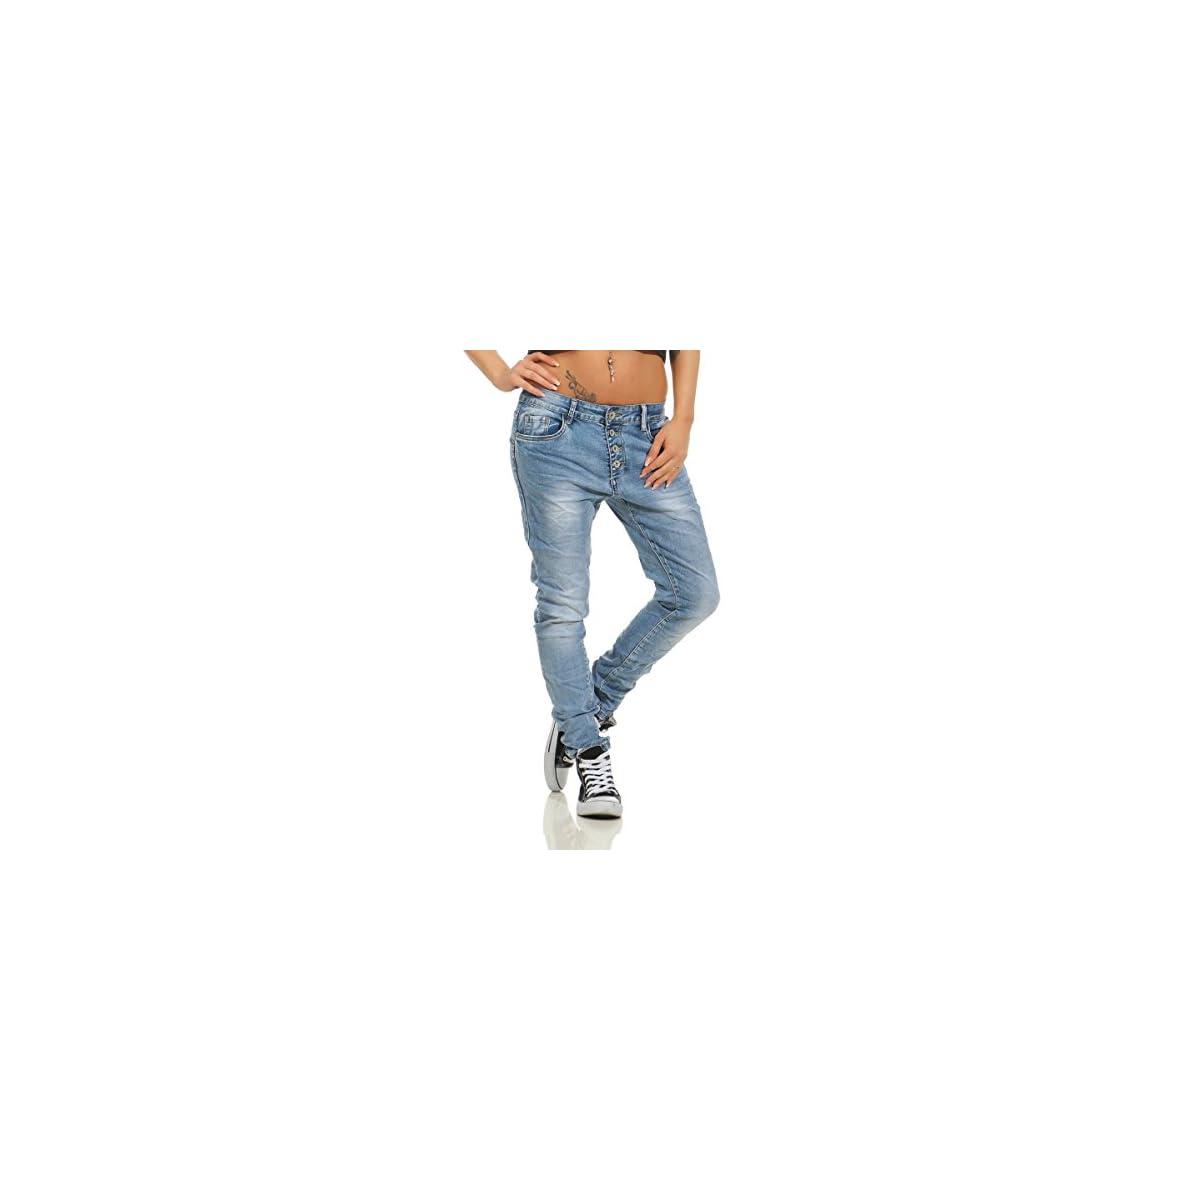 Fashion4Young 11543 Damen Jeans Röhrenjeans